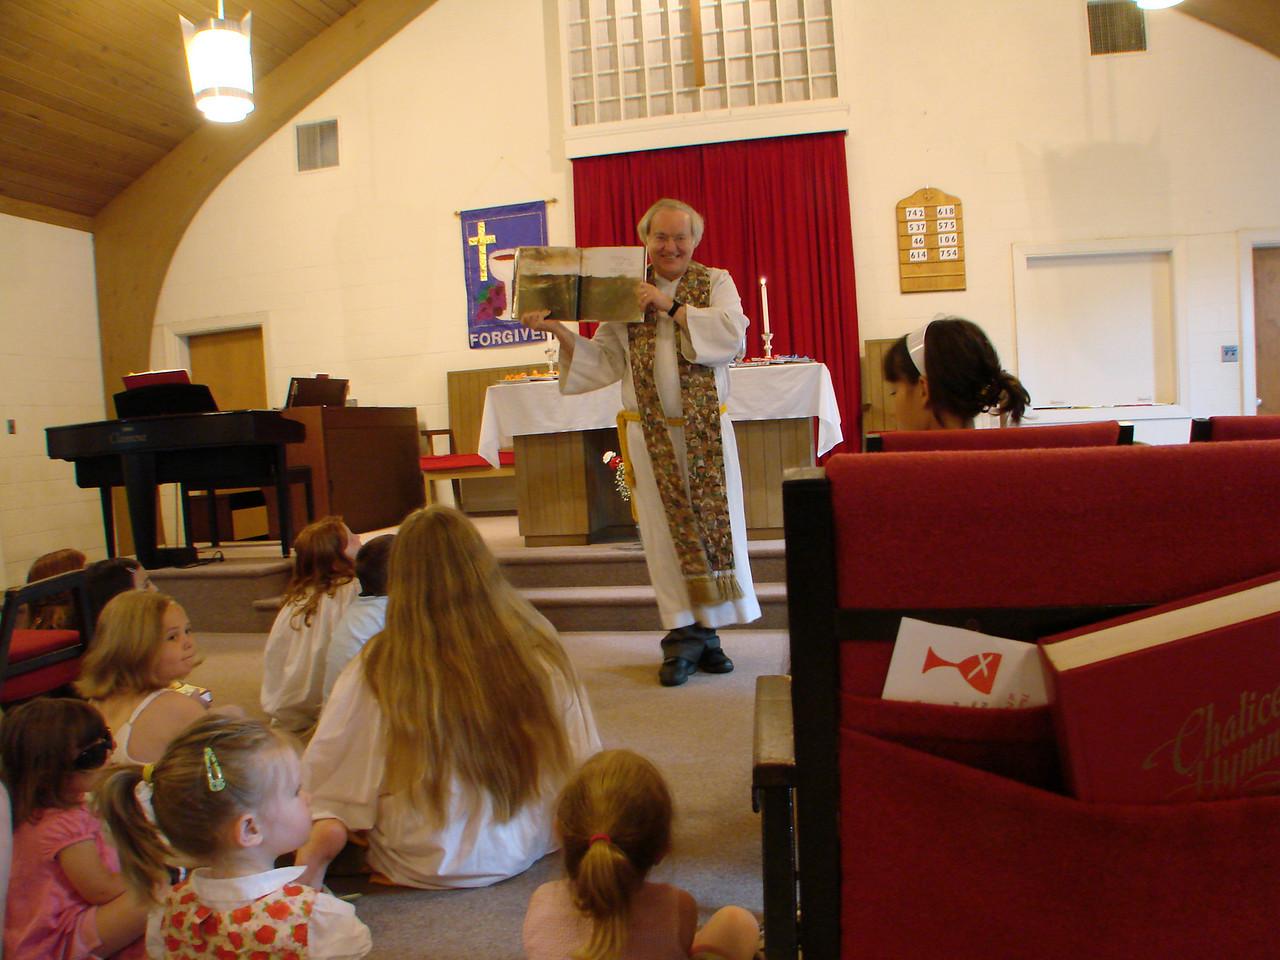 Children's Meditation during worship